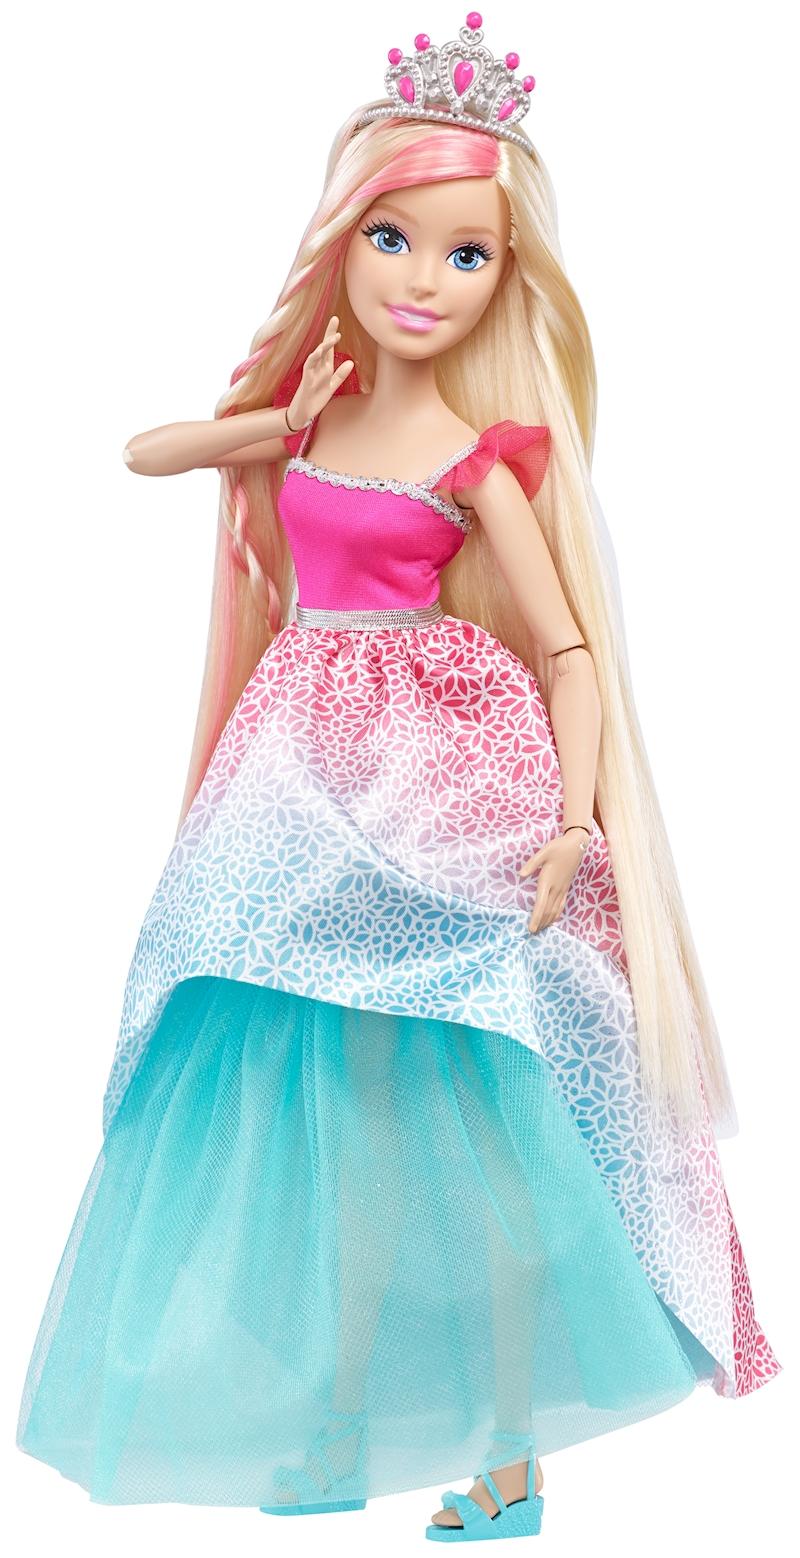 Barbie Princess 17 Doll